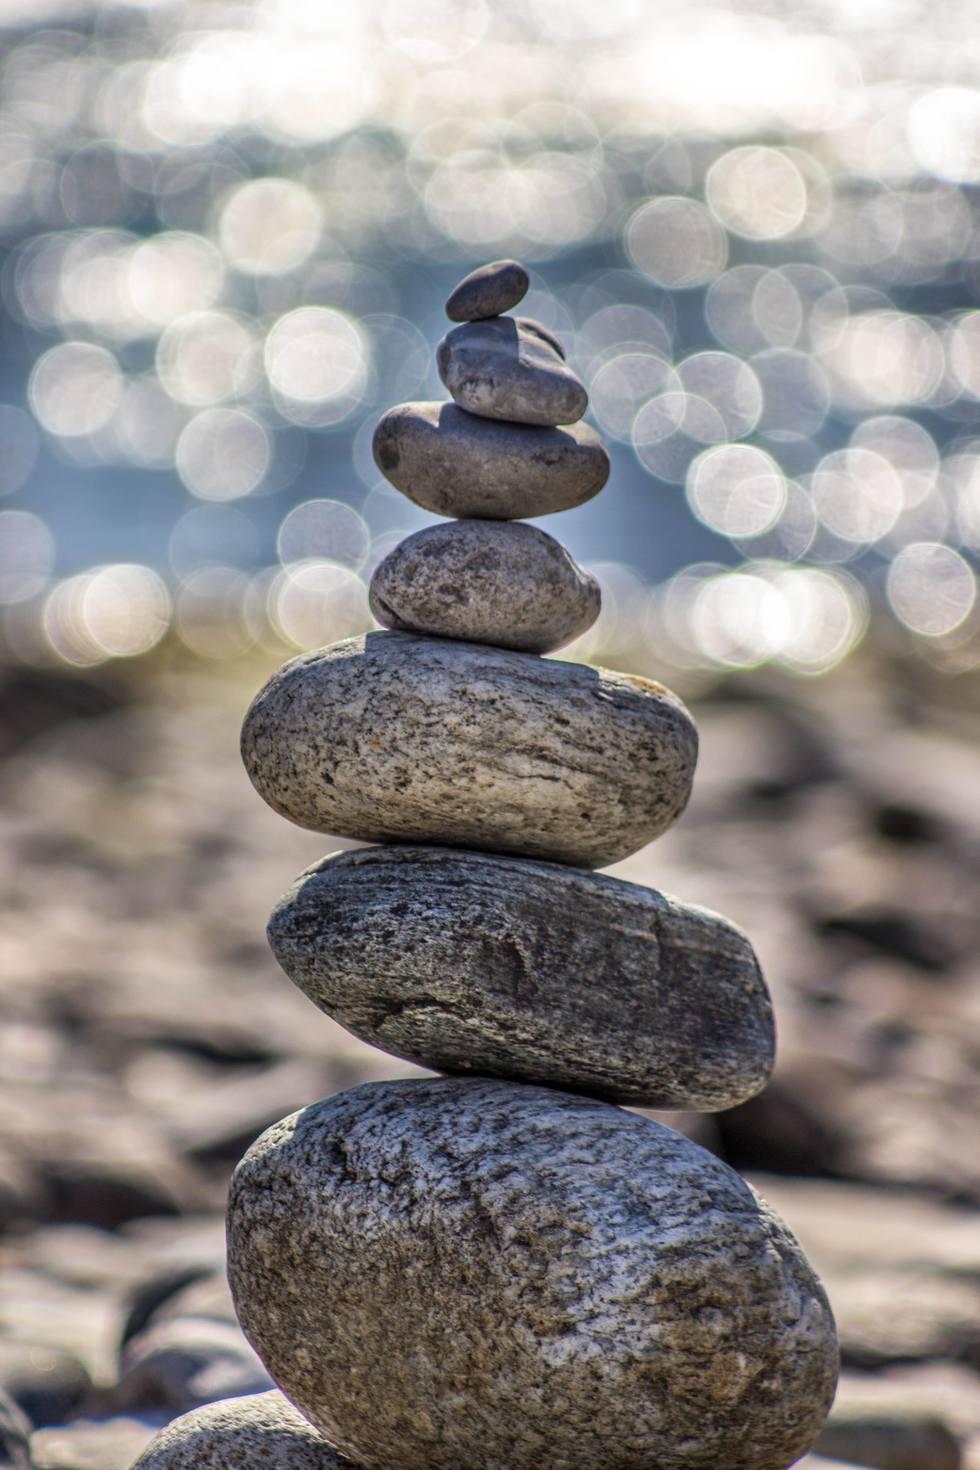 Balancing deniz altindas 38128